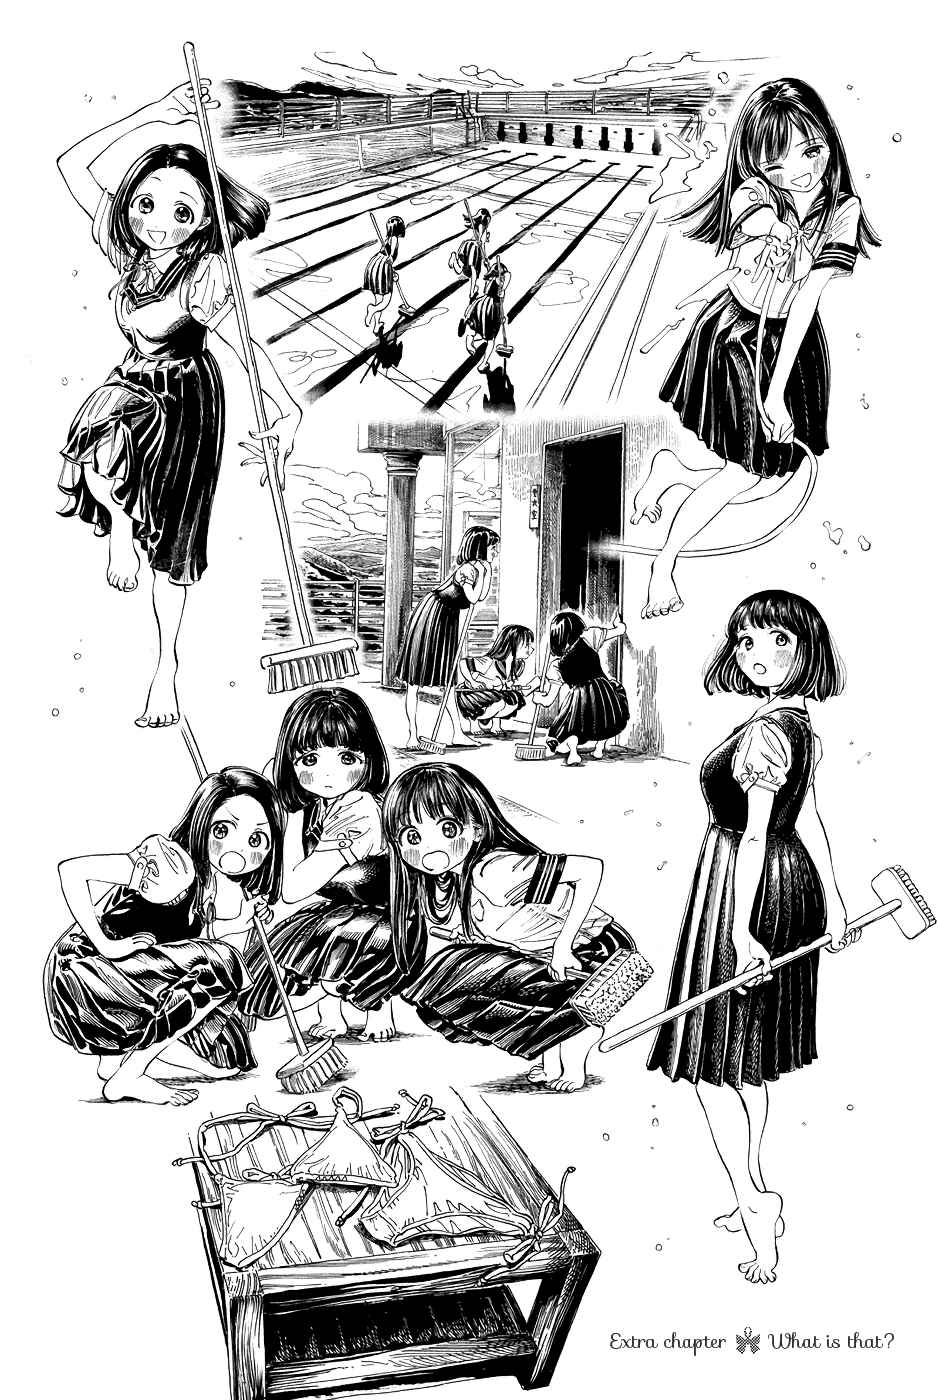 https://manga.mangadogs.com/comics/pic4/36/18532/1633425/f045f4b5d55f548ce2fb8fdcb6c15129.jpg Page 1